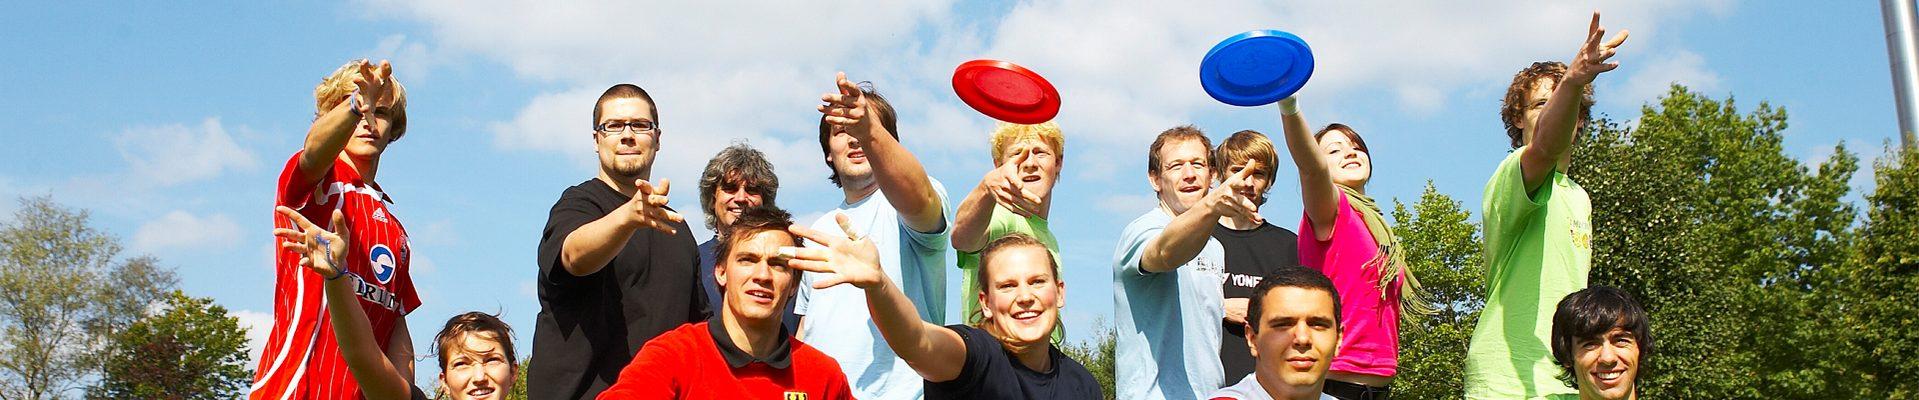 Sportjugend NRW